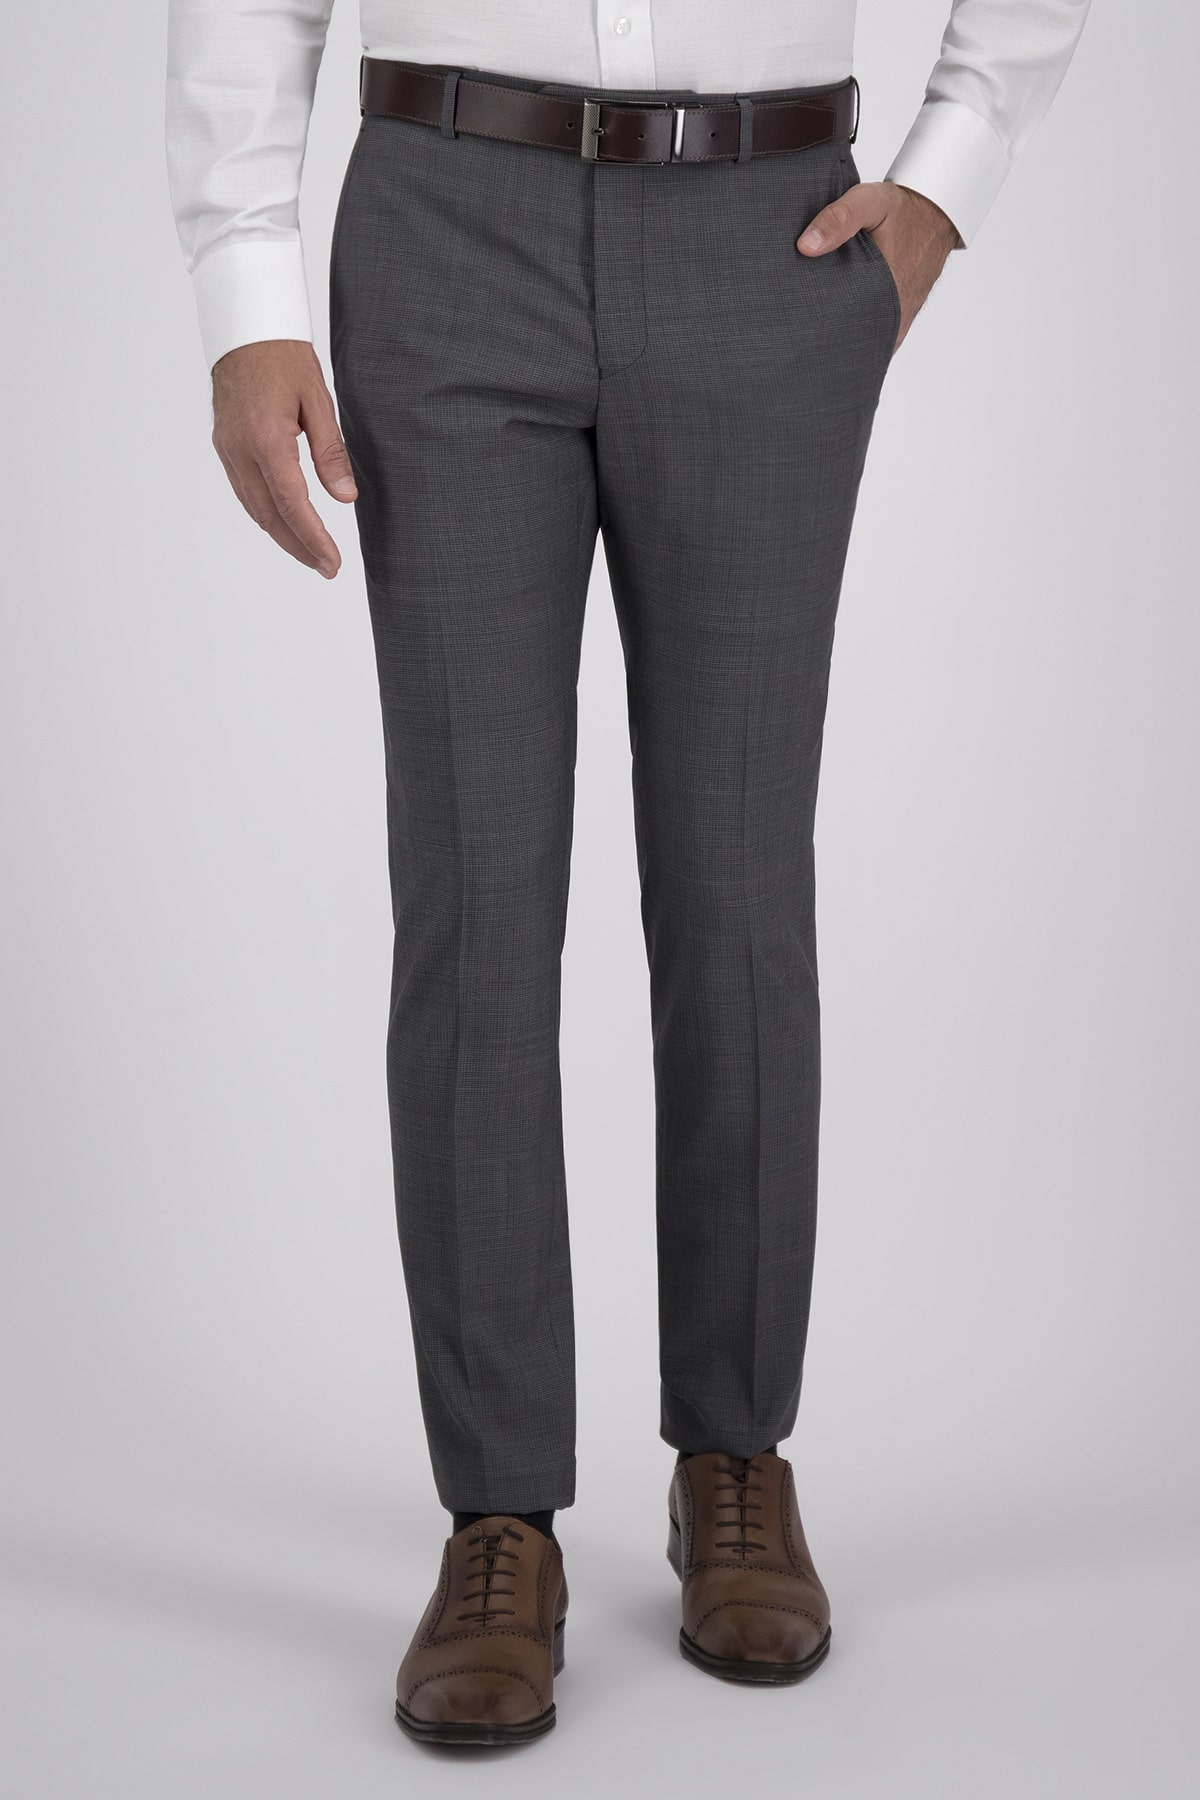 Pantalón Vestir High Life con tejido 100% Lana Gris, Corte Slim